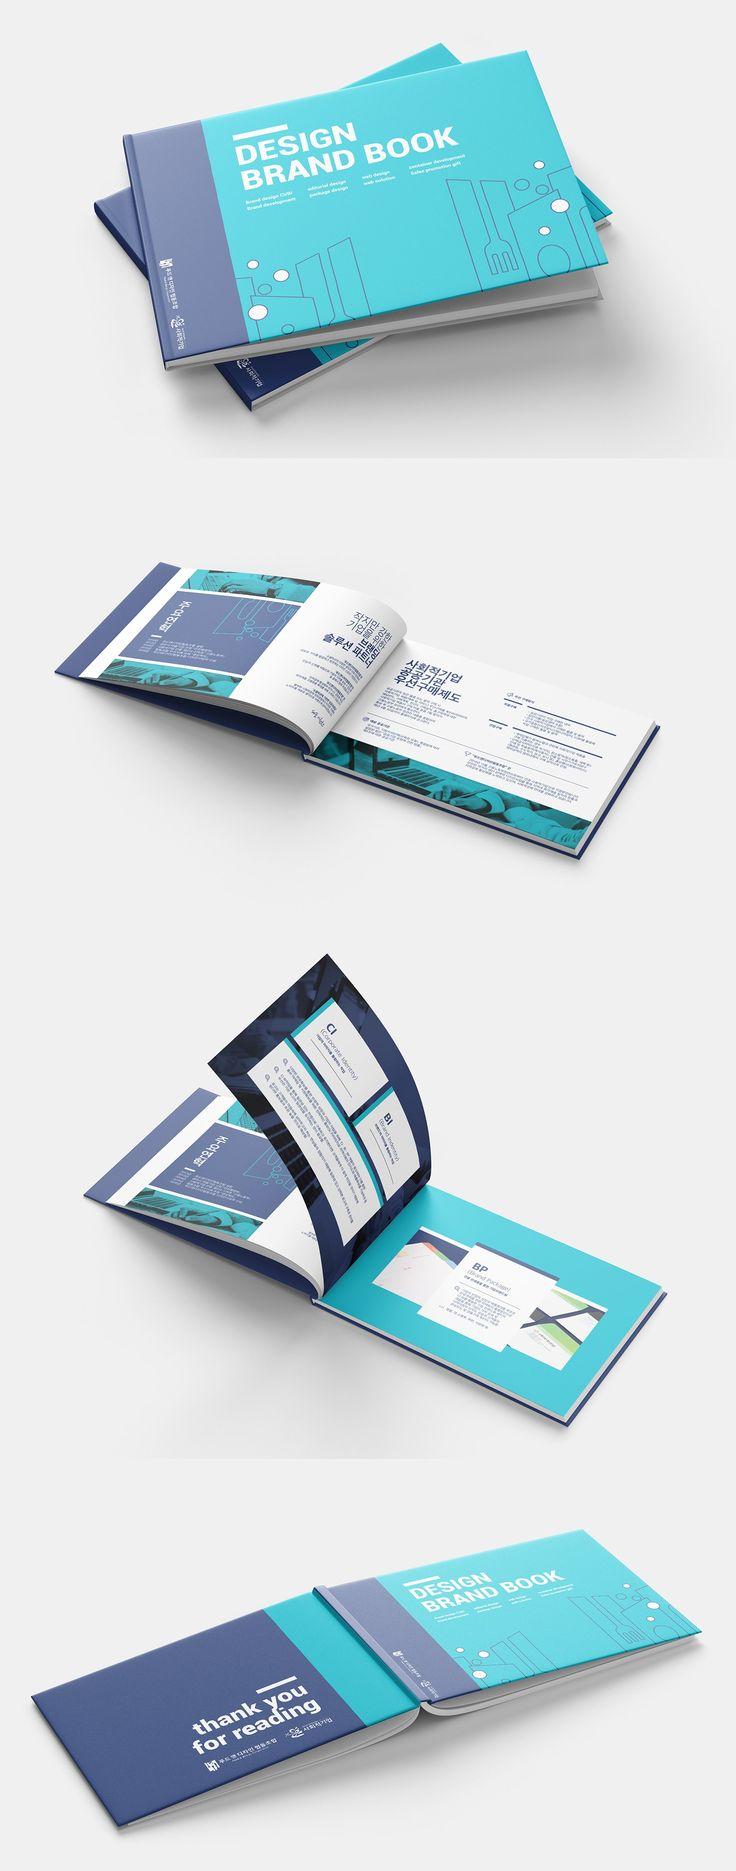 Design by minzzz/ #브로셔디자인 #리플렛디자인 #브로셔 #리플렛 #bruchure #leaflet #아이덴티티 #identity  #디자인 #디자이너 #라우드소싱 #레퍼런스 #콘테스트 #editorial #design #illust #포트폴리오 #디자인의뢰 #공모전 #일러스트 #편집 #편집디자인 #일러스트 #card #color #타이포그래피 #레이아웃 #layout #레퍼런스 #reference